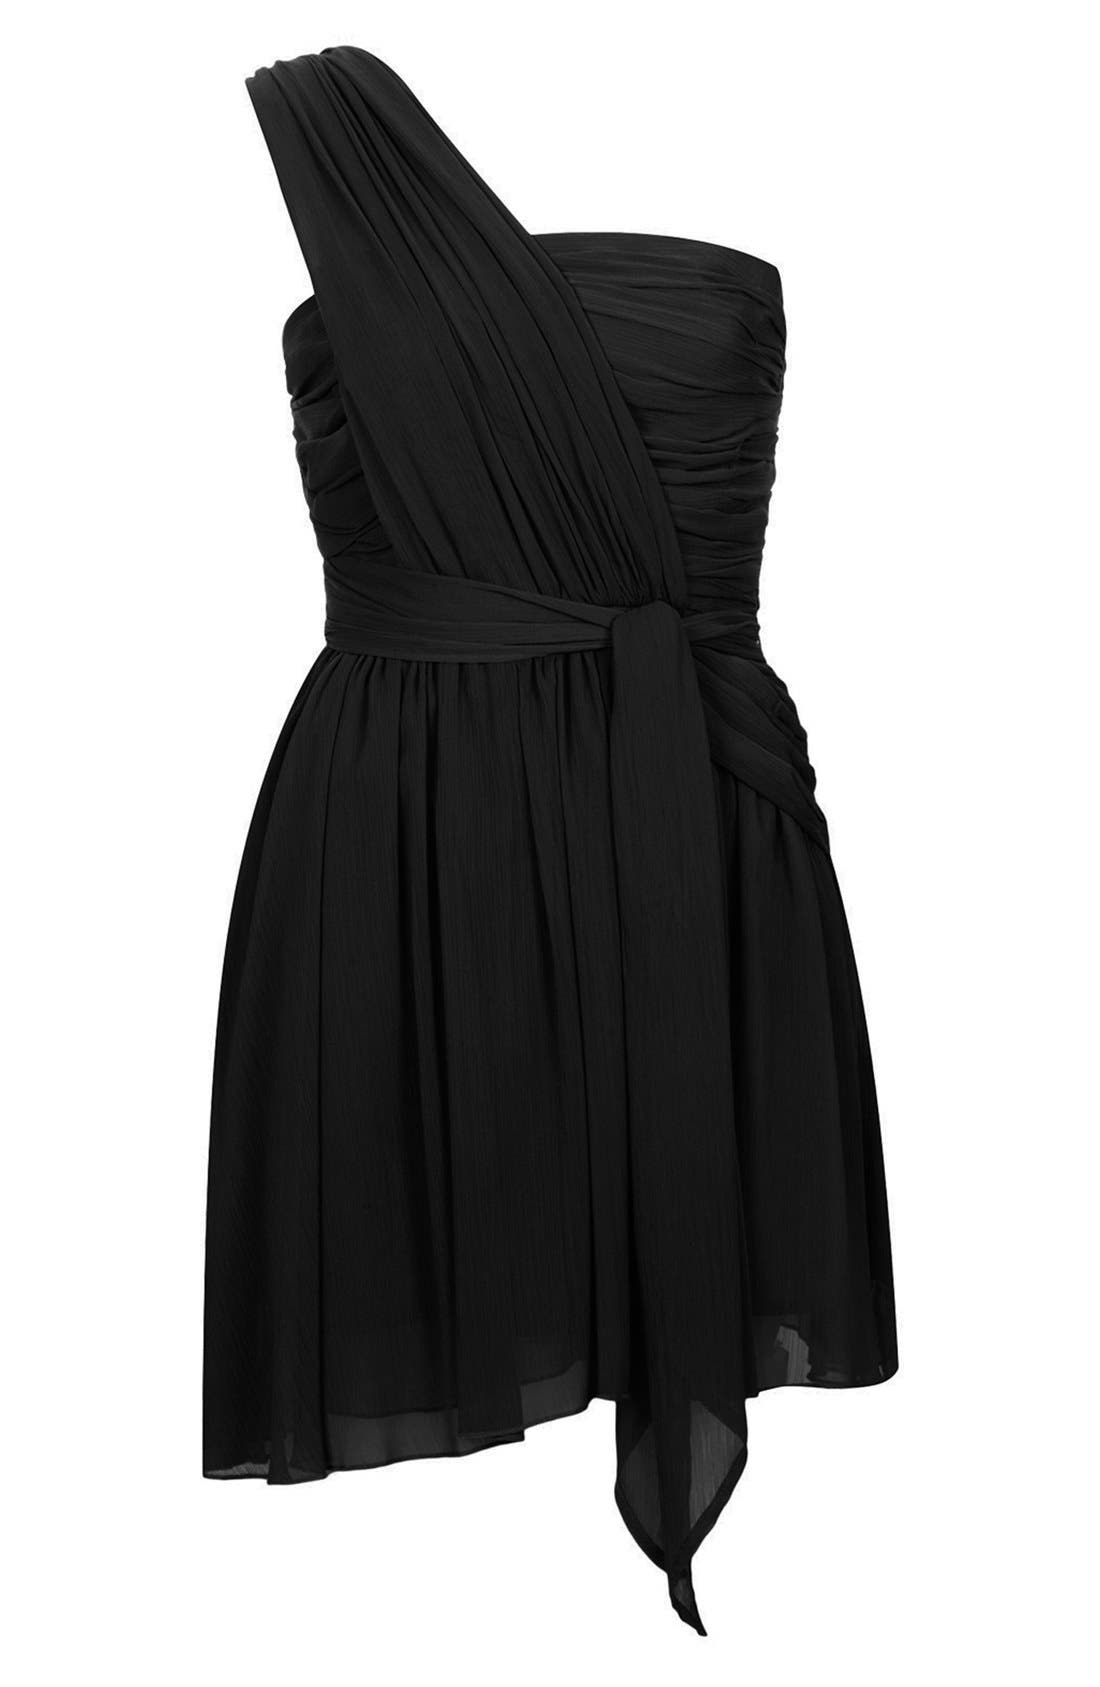 TOPSHOP, Kate Moss for Topshop One-Shoulder Chiffon Dress, Alternate thumbnail 5, color, 001